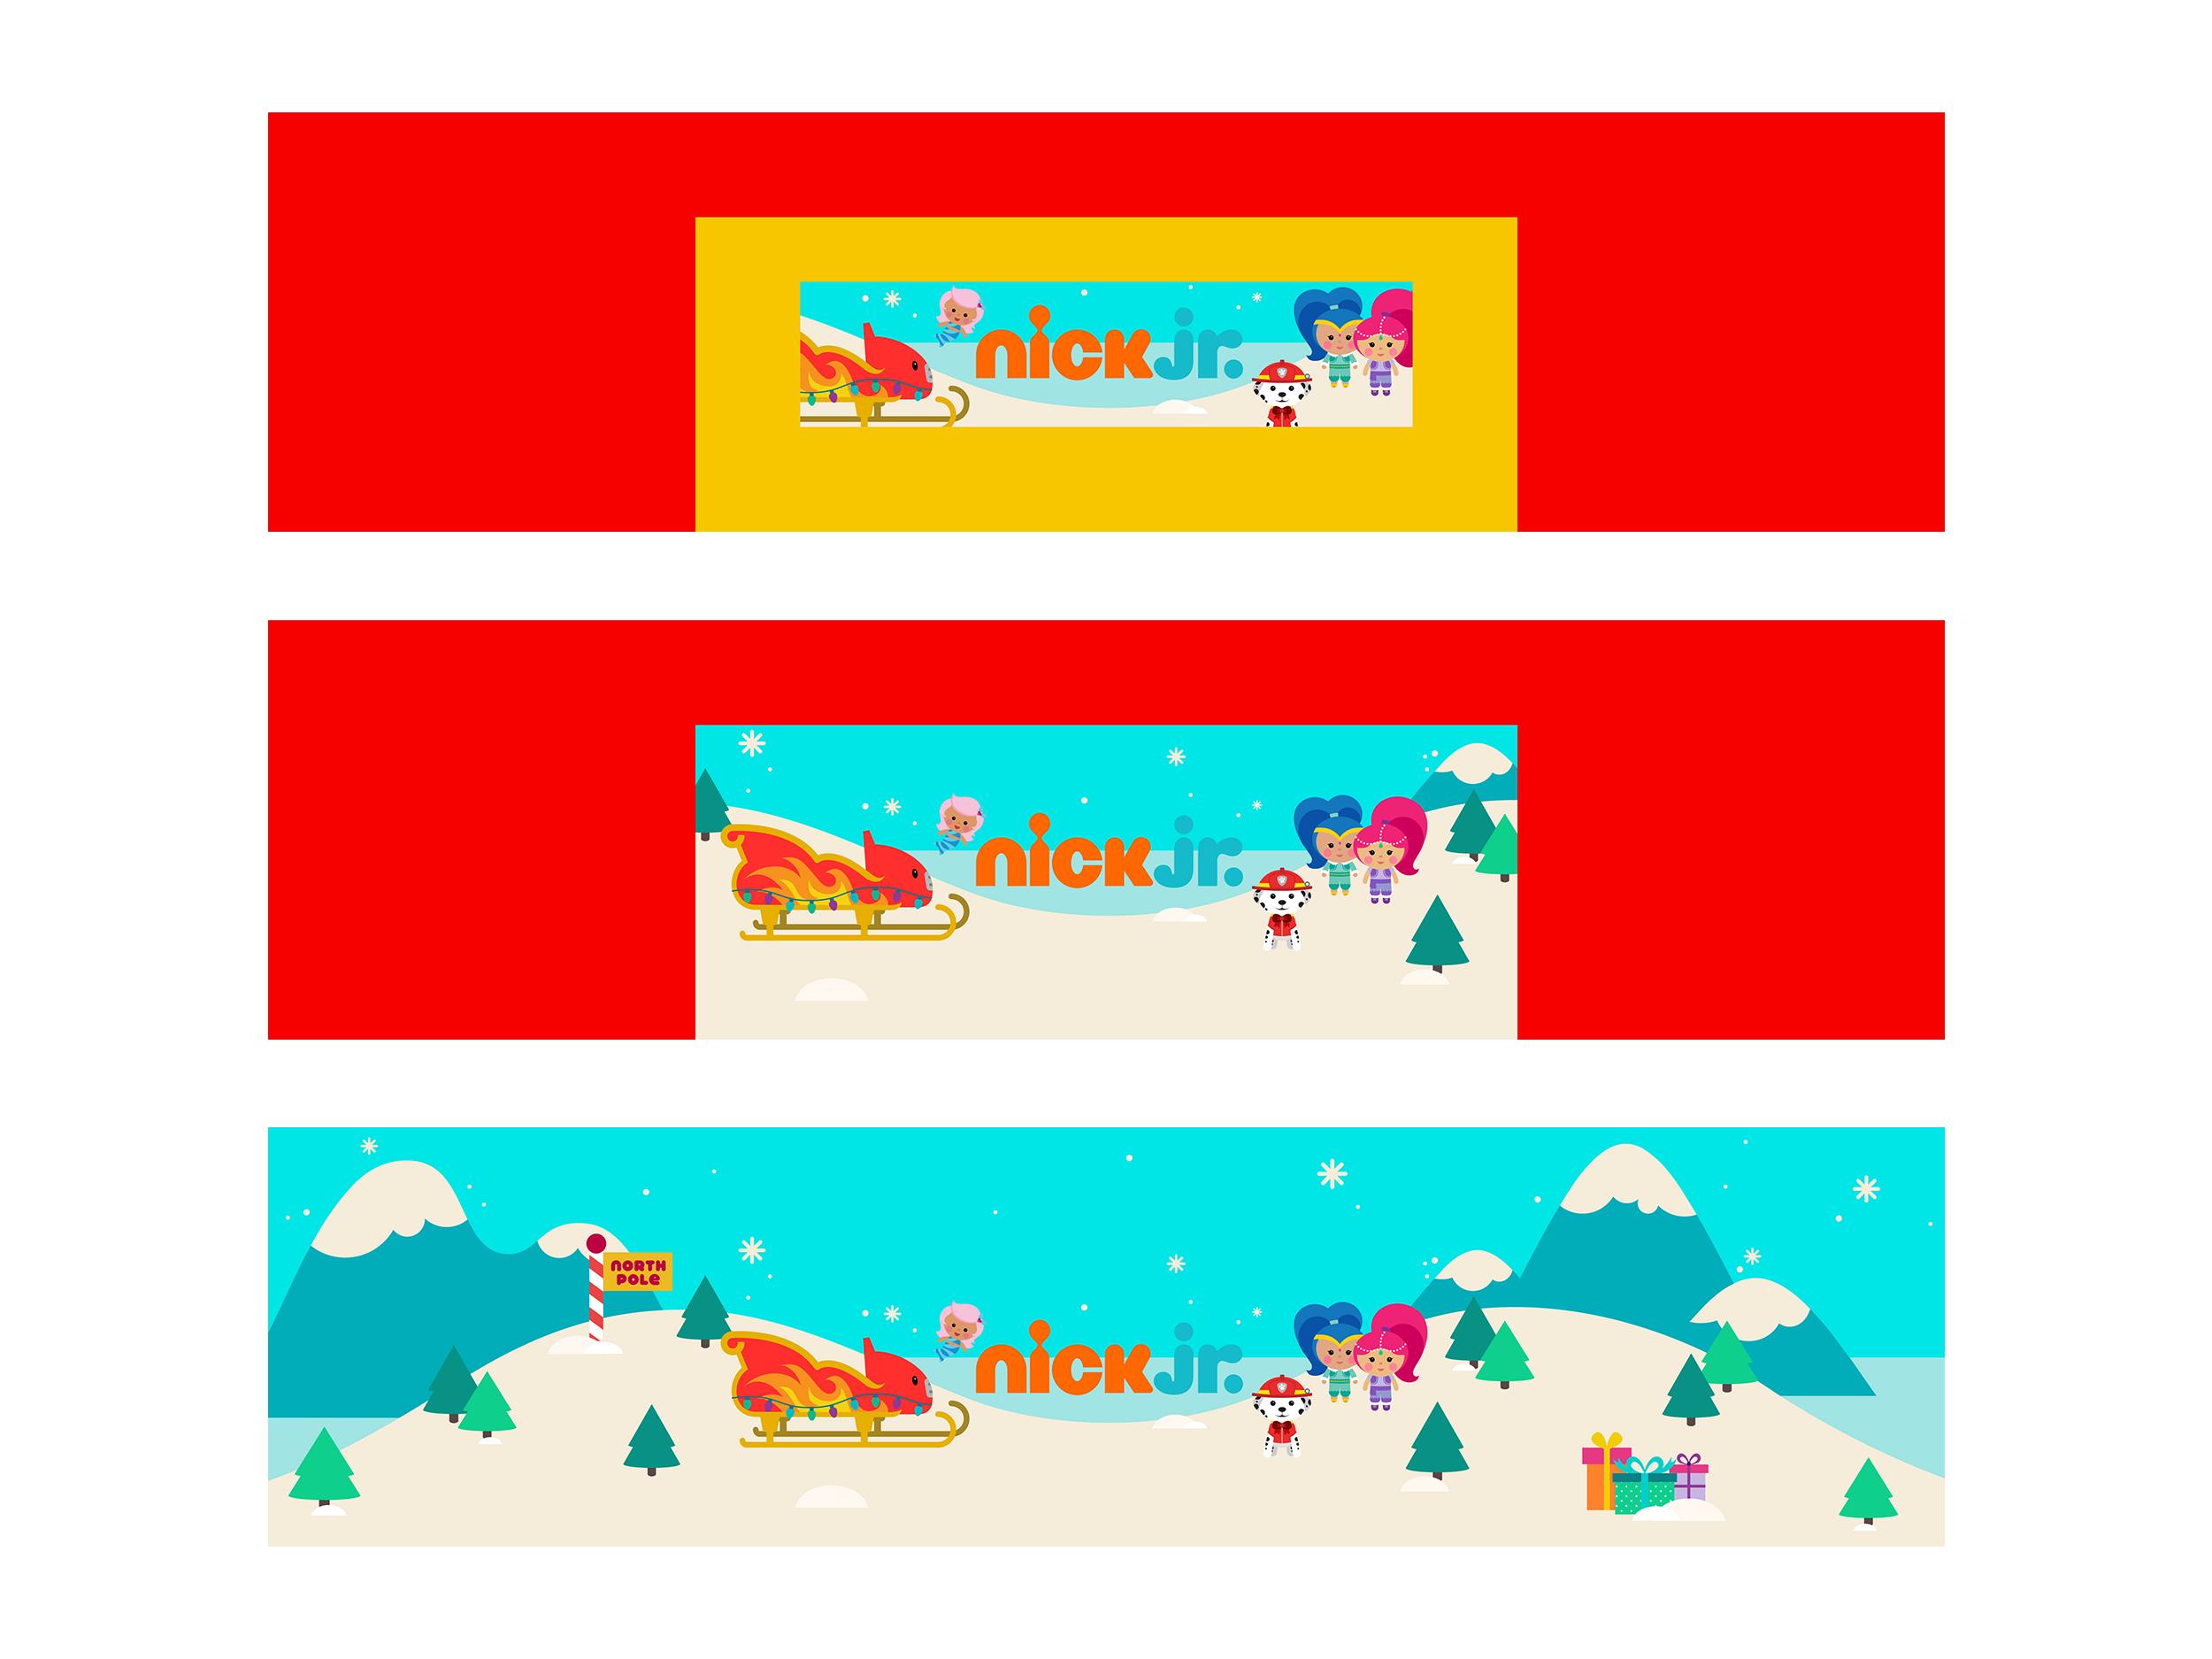 nickjr-itunes-store-mockup.png